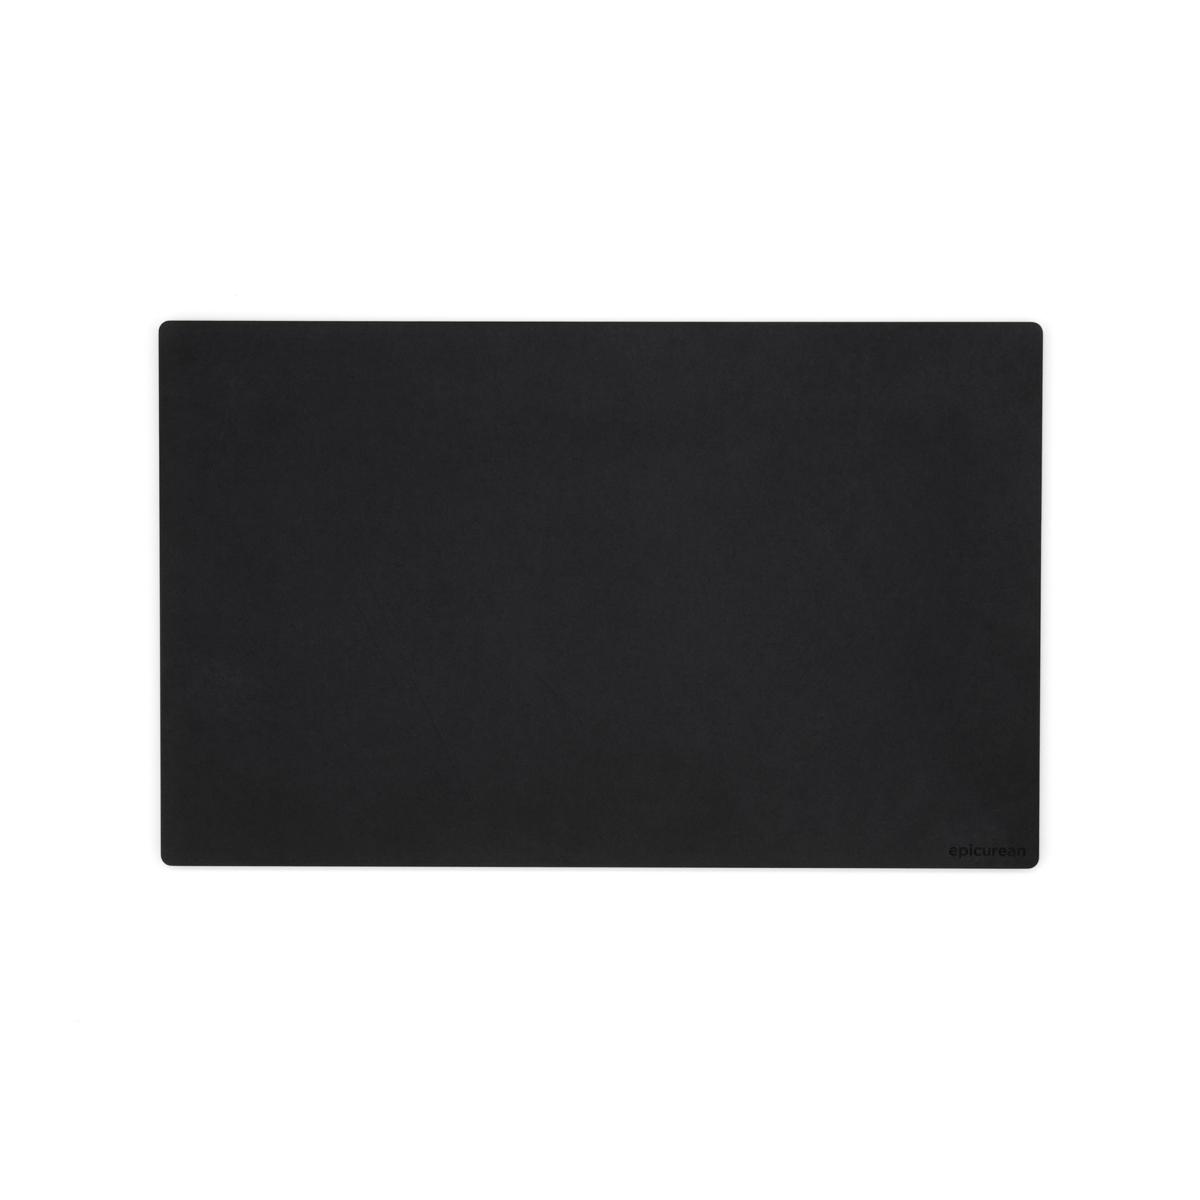 Epicurean Rectangle Series Slate 13.75 Inch Display Board